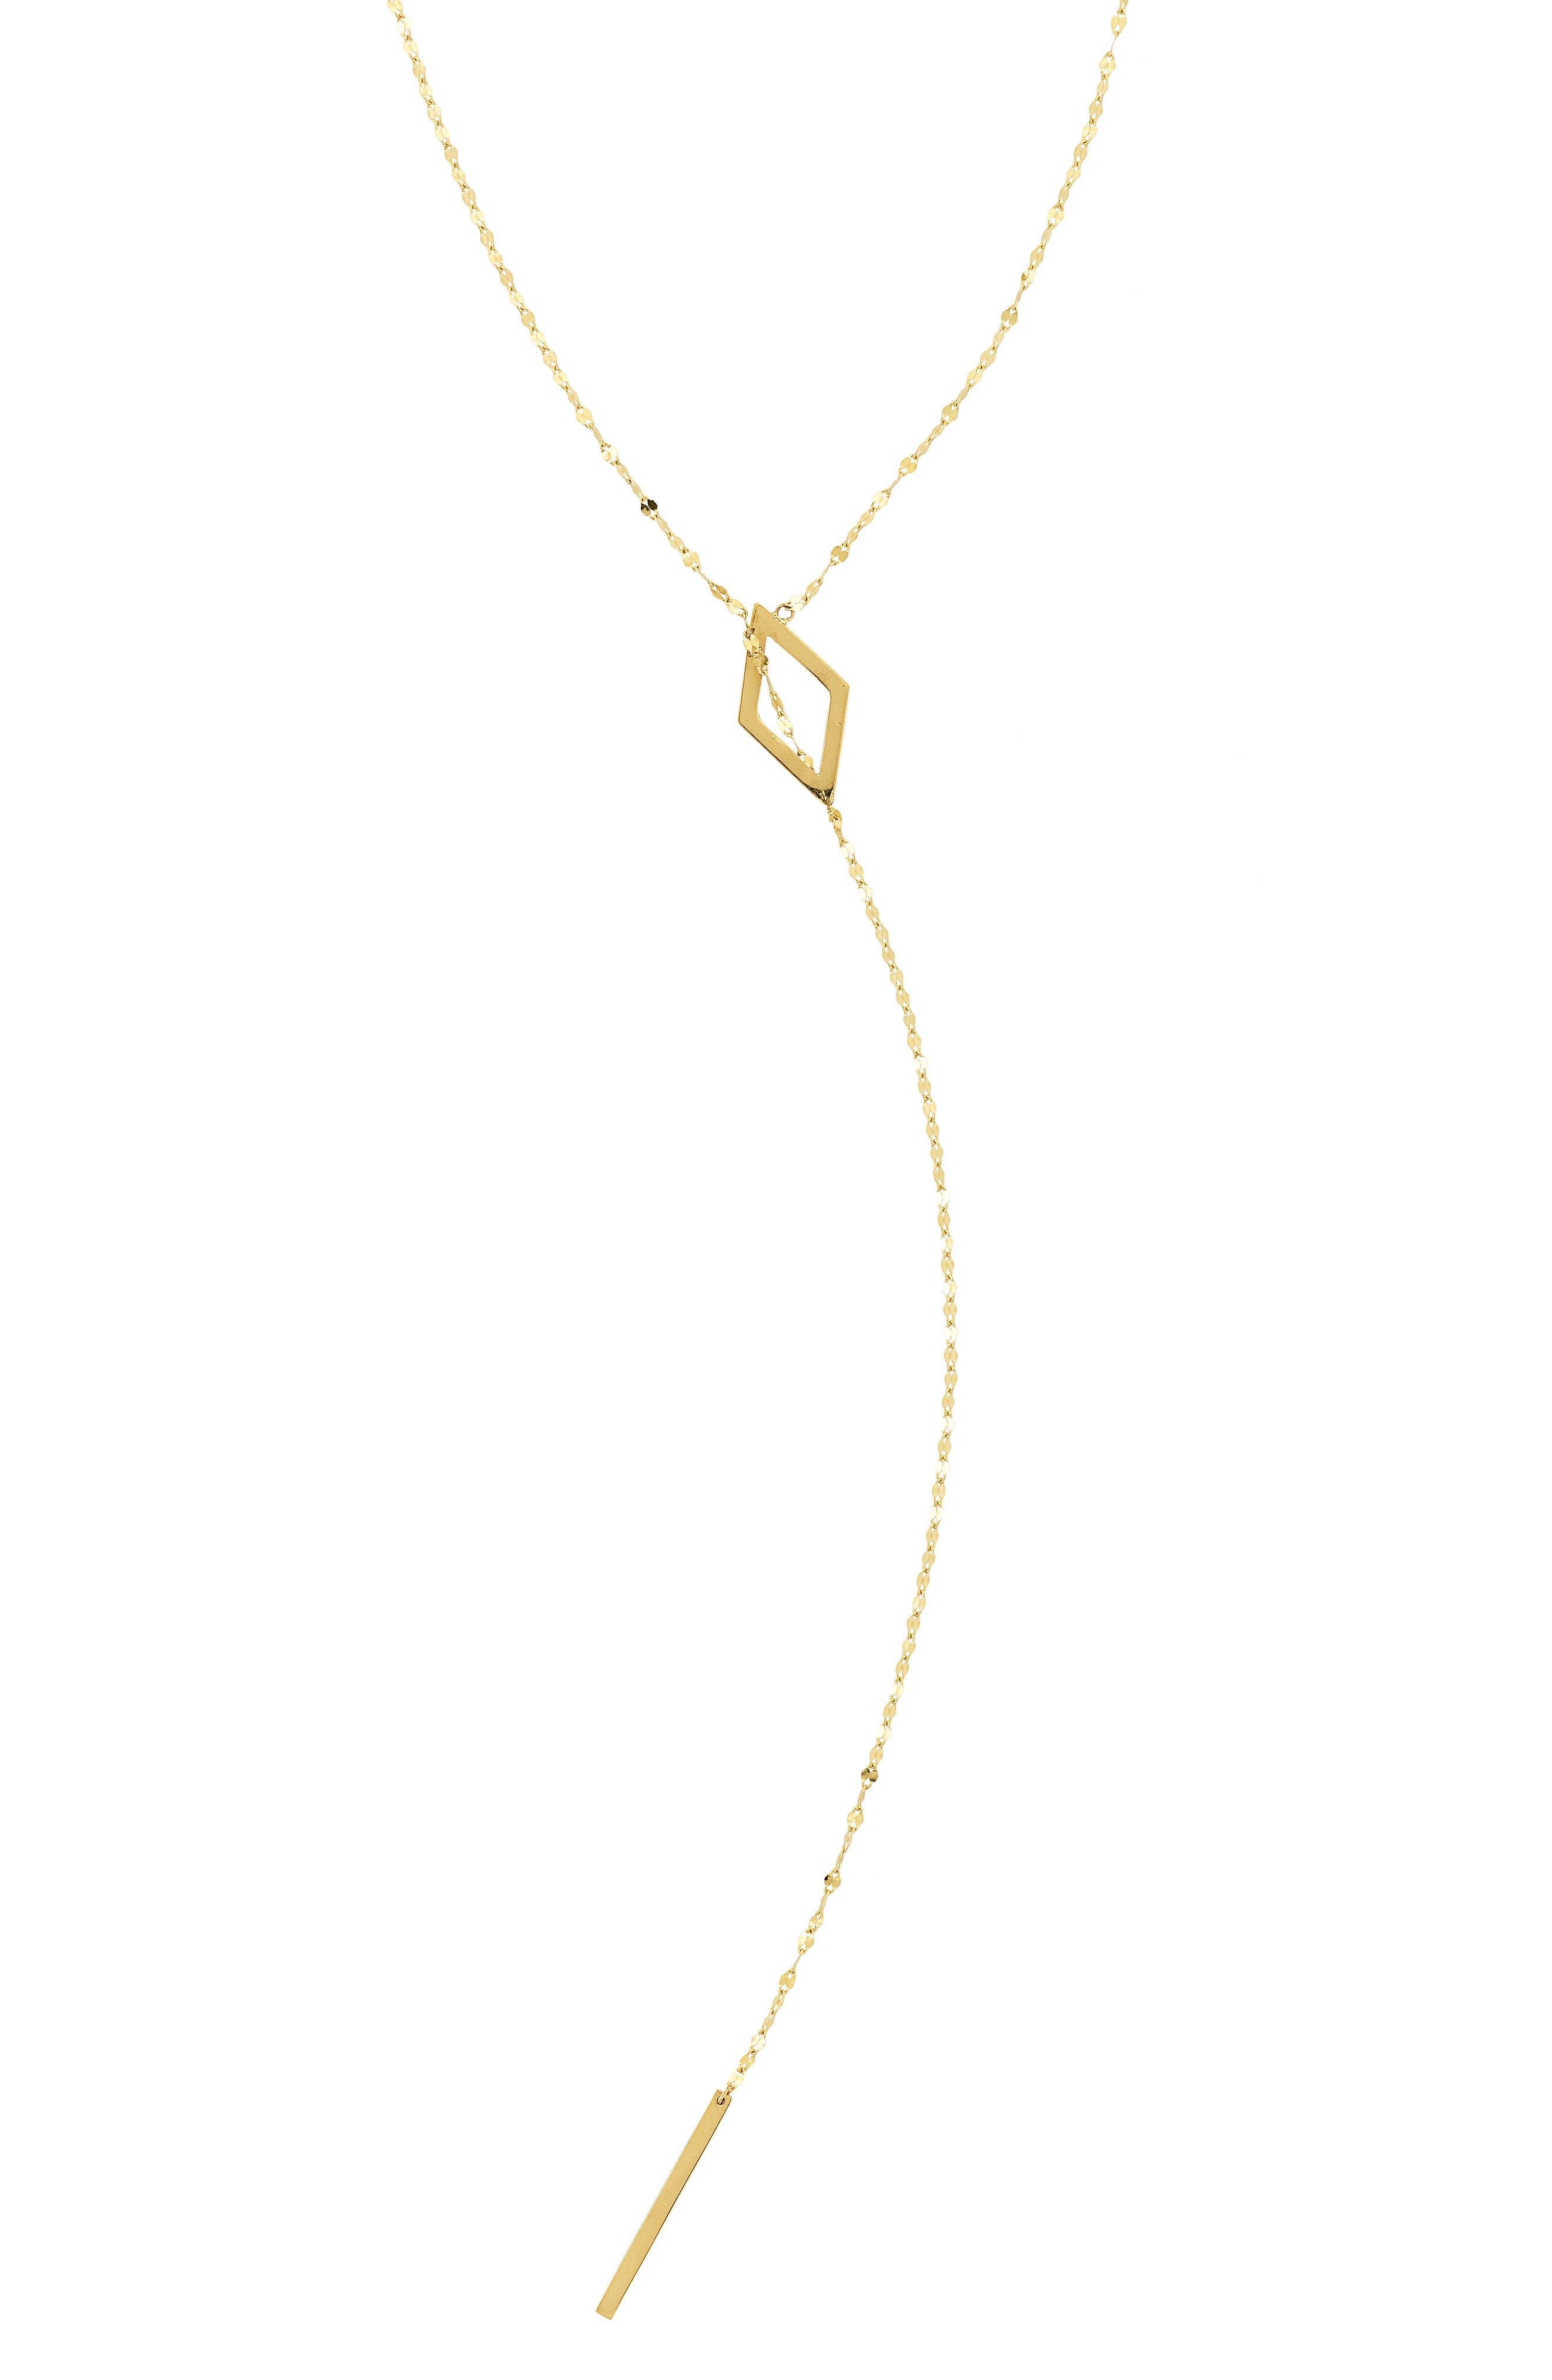 Lana Jewelry Lariat Necklace